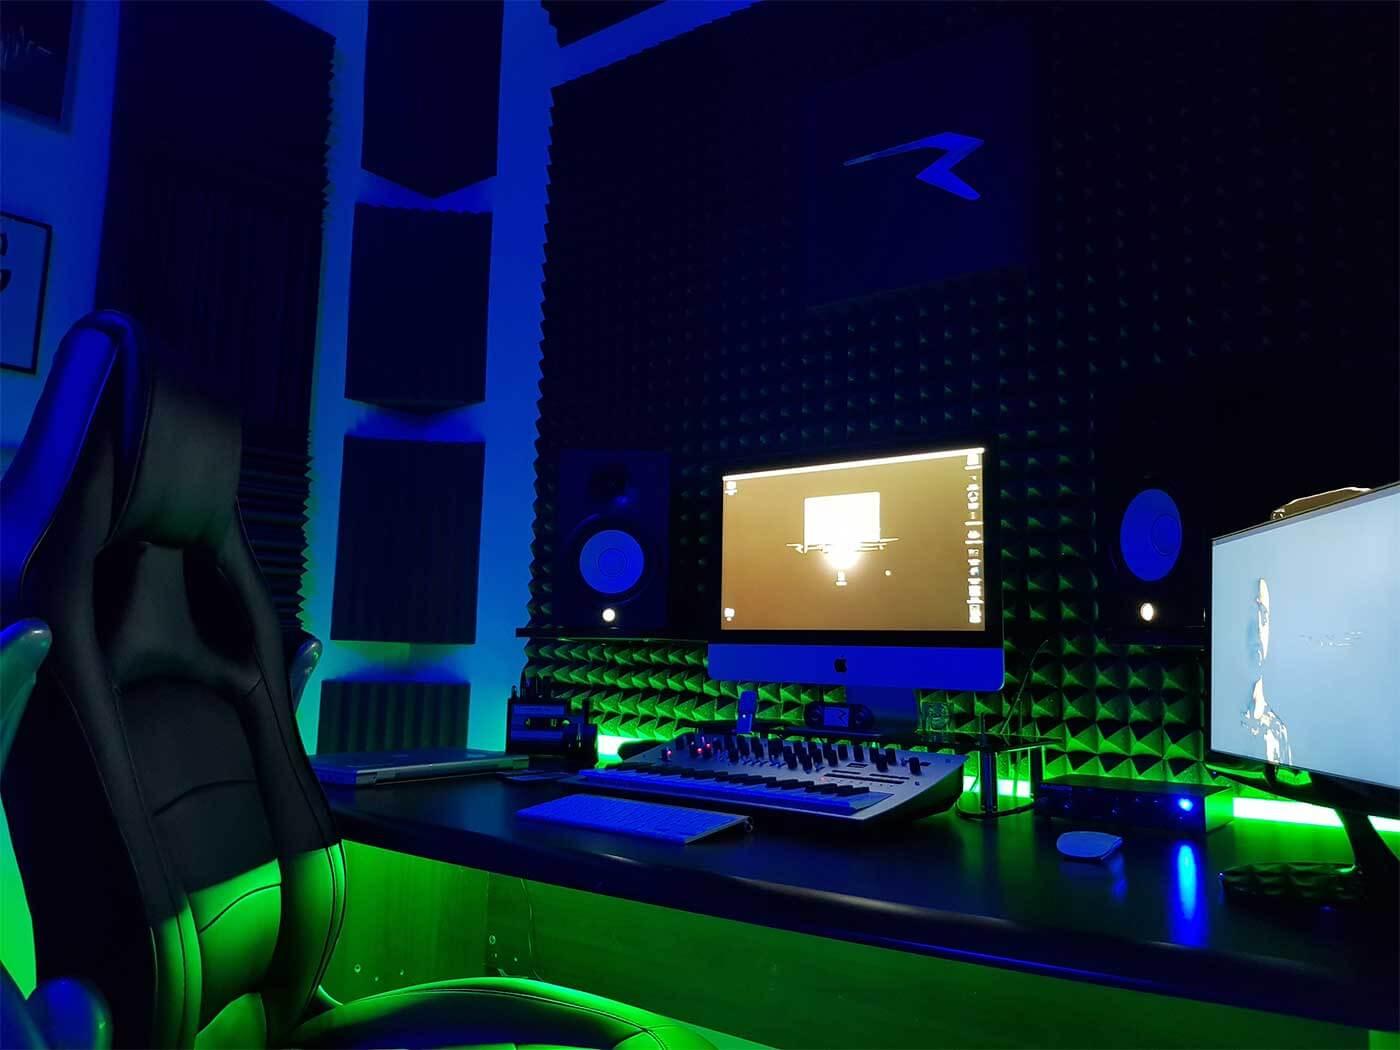 Show Off Your Studio: Rhalef's Italian techno hideout - MusicTech